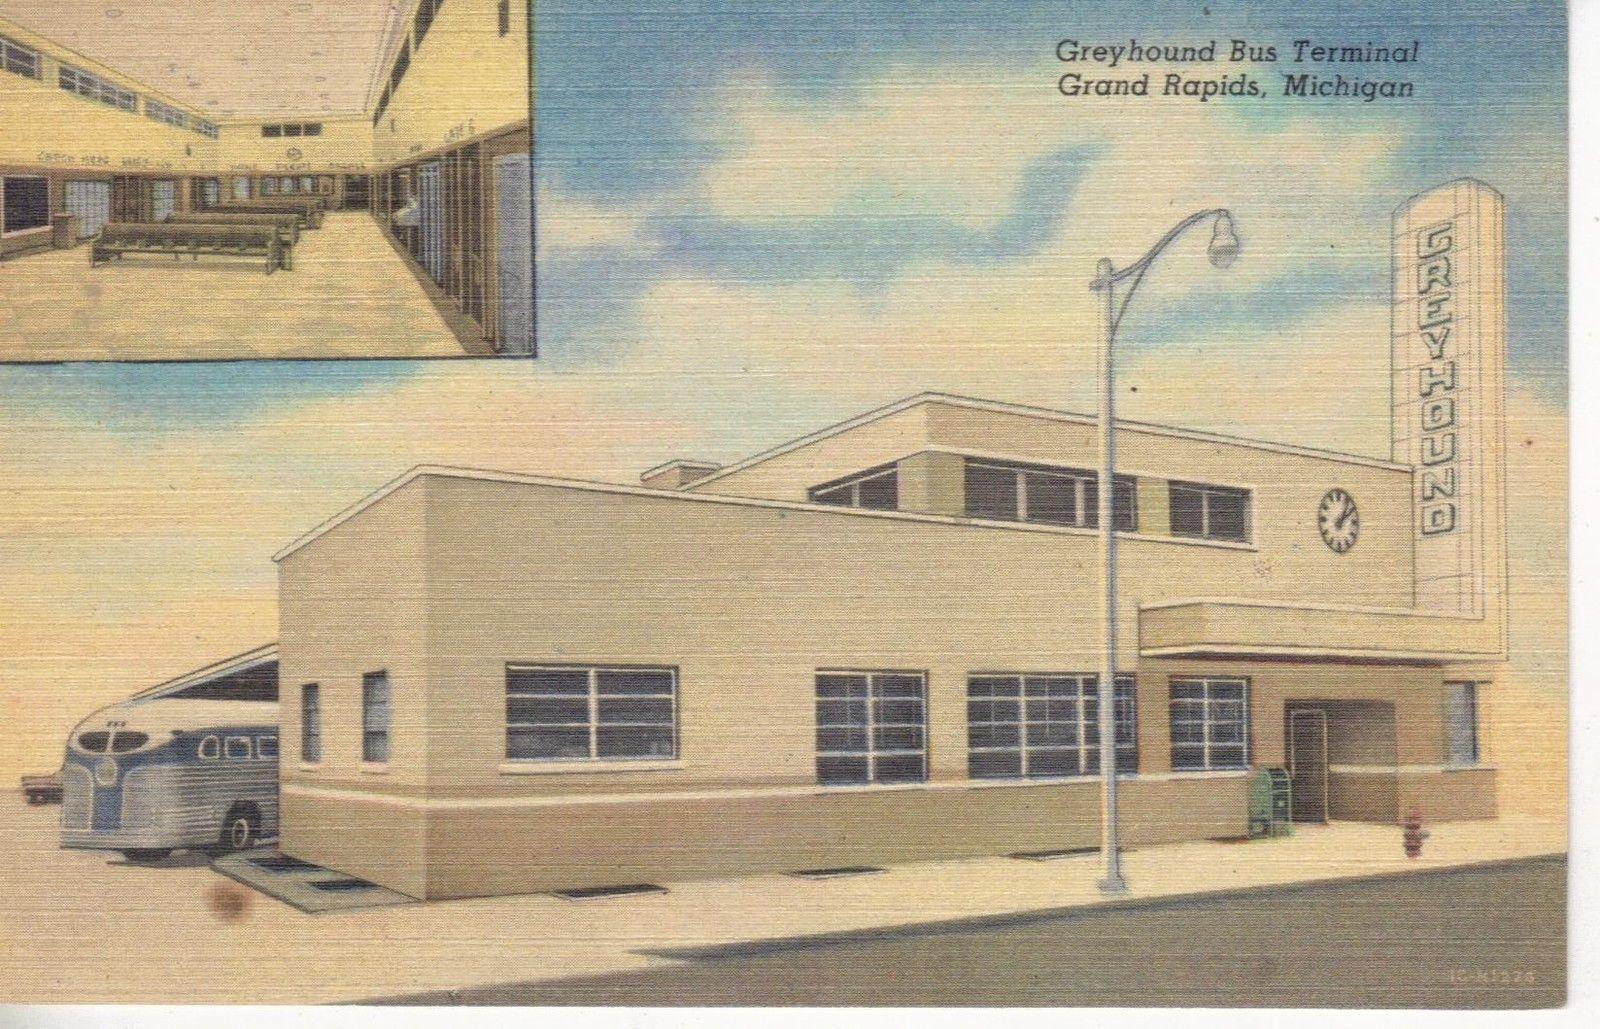 Greyhound Bus Terminal Postcard Late 1950s Greyhound Bus Grand Rapids Bus Terminal